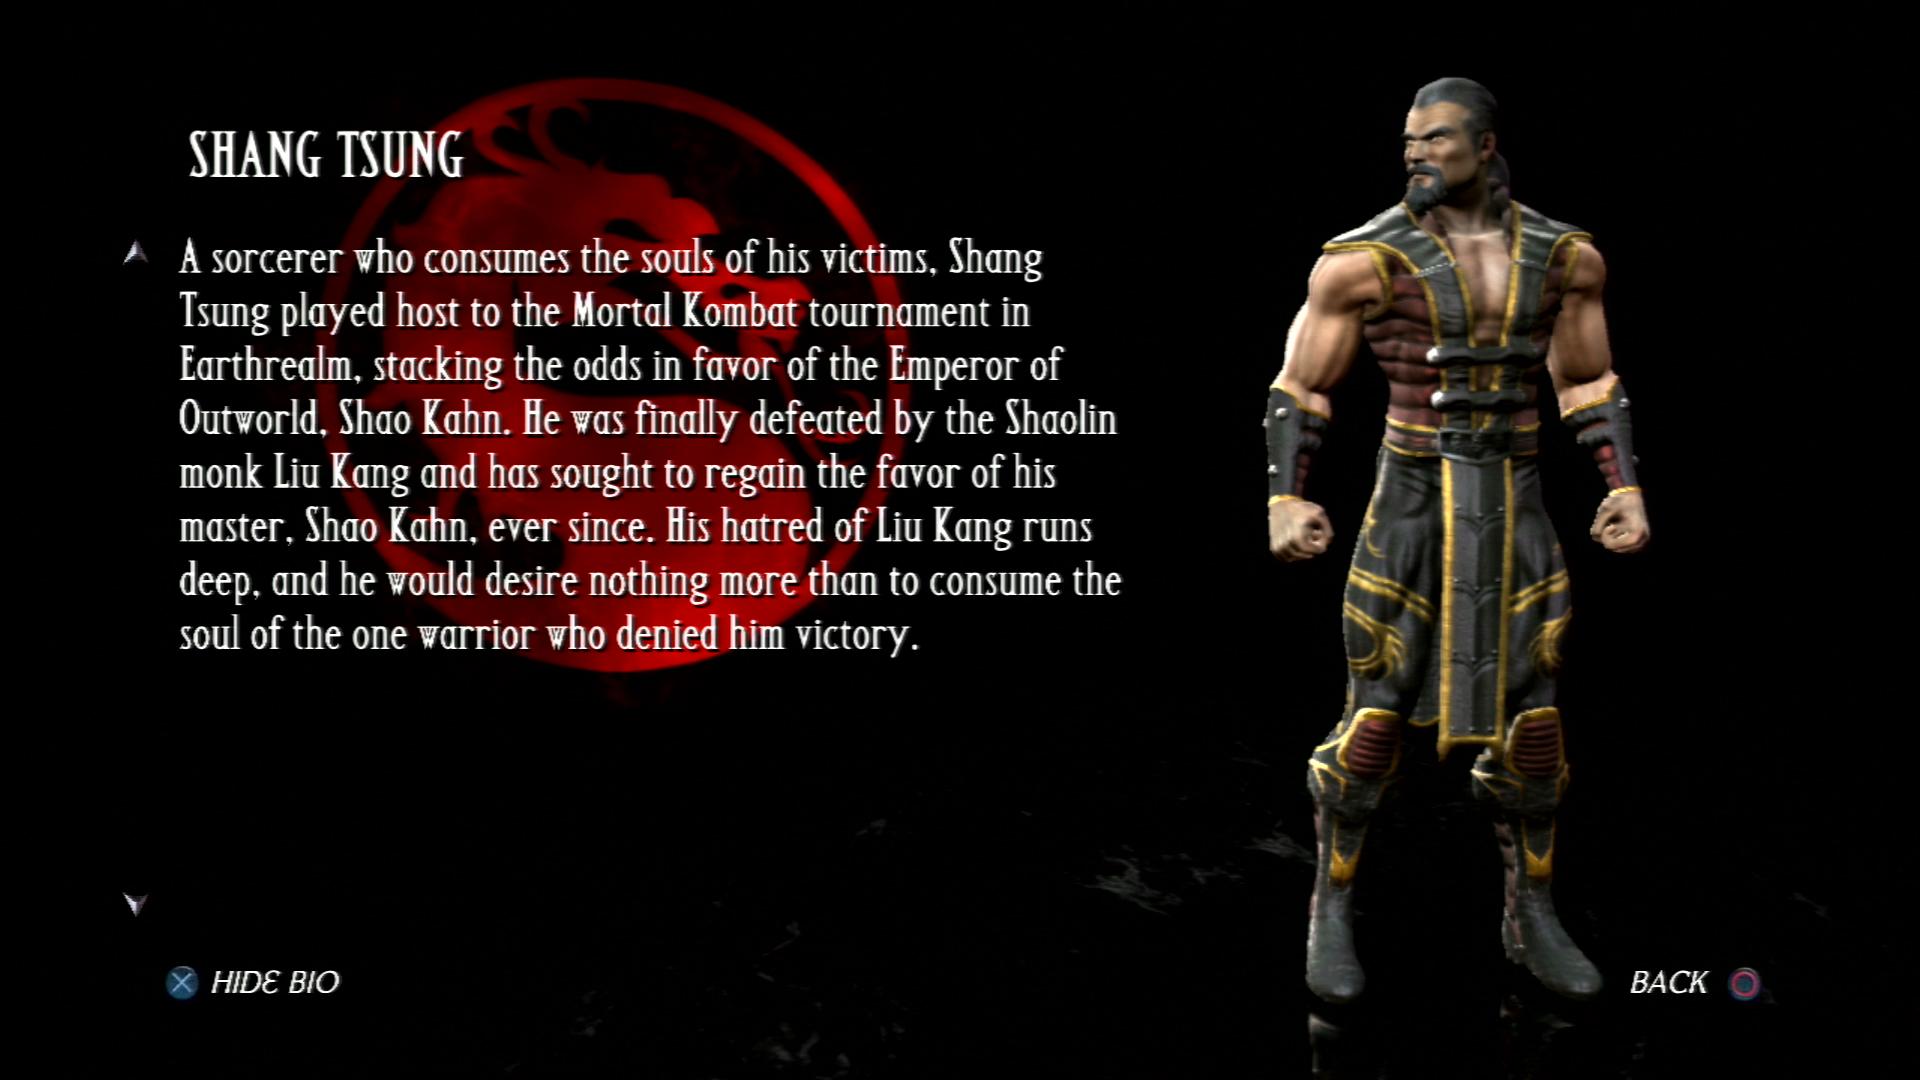 Шан Цзун - Mortal Kombat vs. DC Universe Персонаж